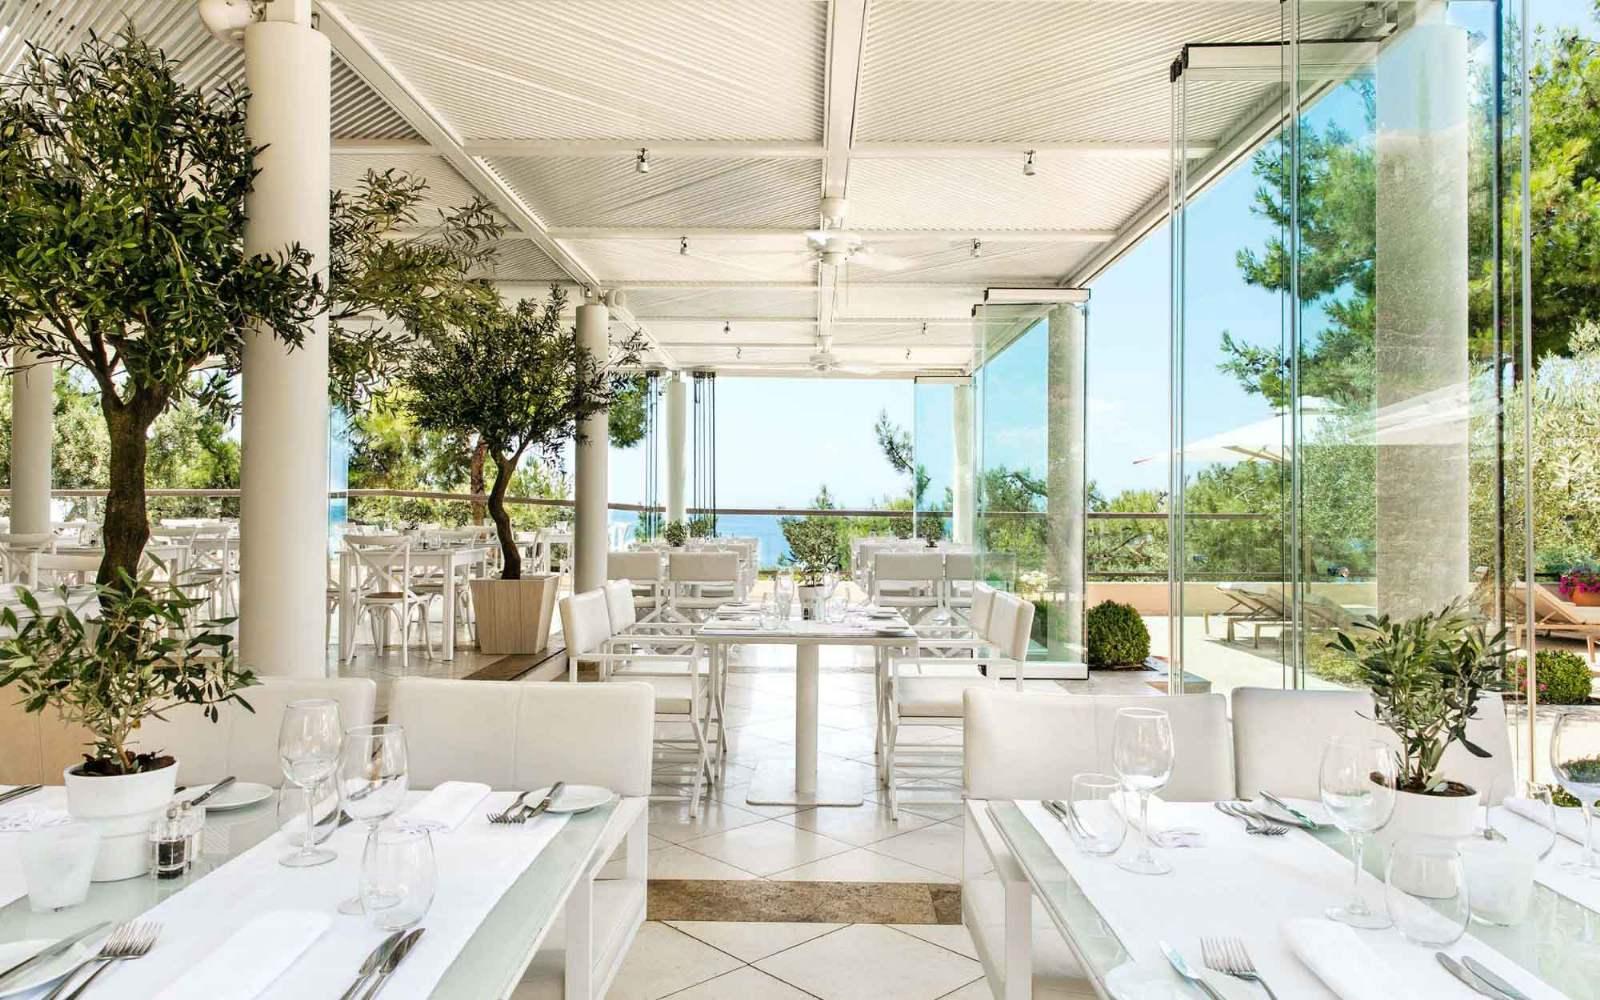 Ikos Oceania - Ouzo restaurant